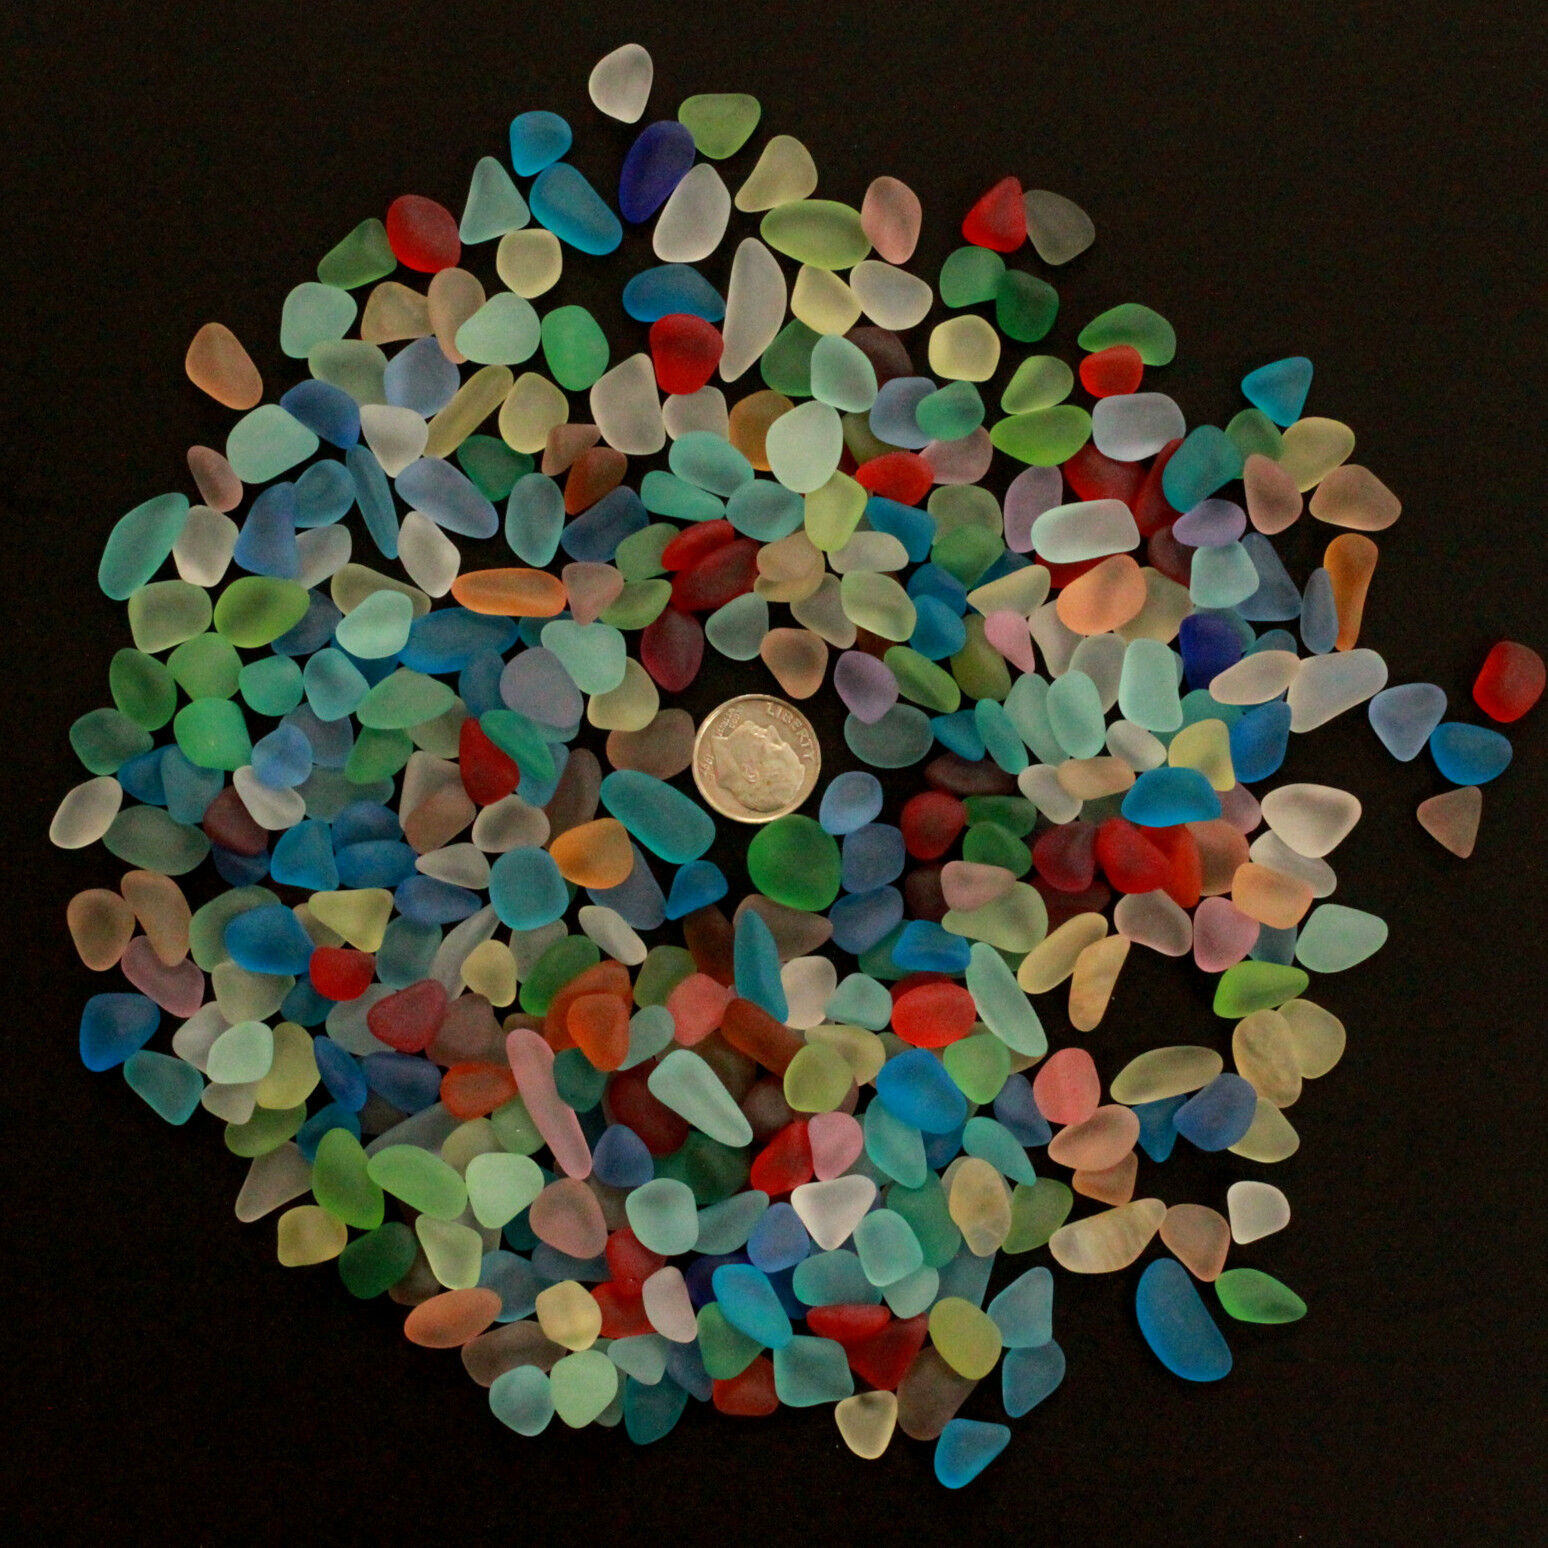 как выглядит Пляжное стекло - природной обработки sea beach glass mixed color lot bulk wholesale blue green red yellow jewelry use фото